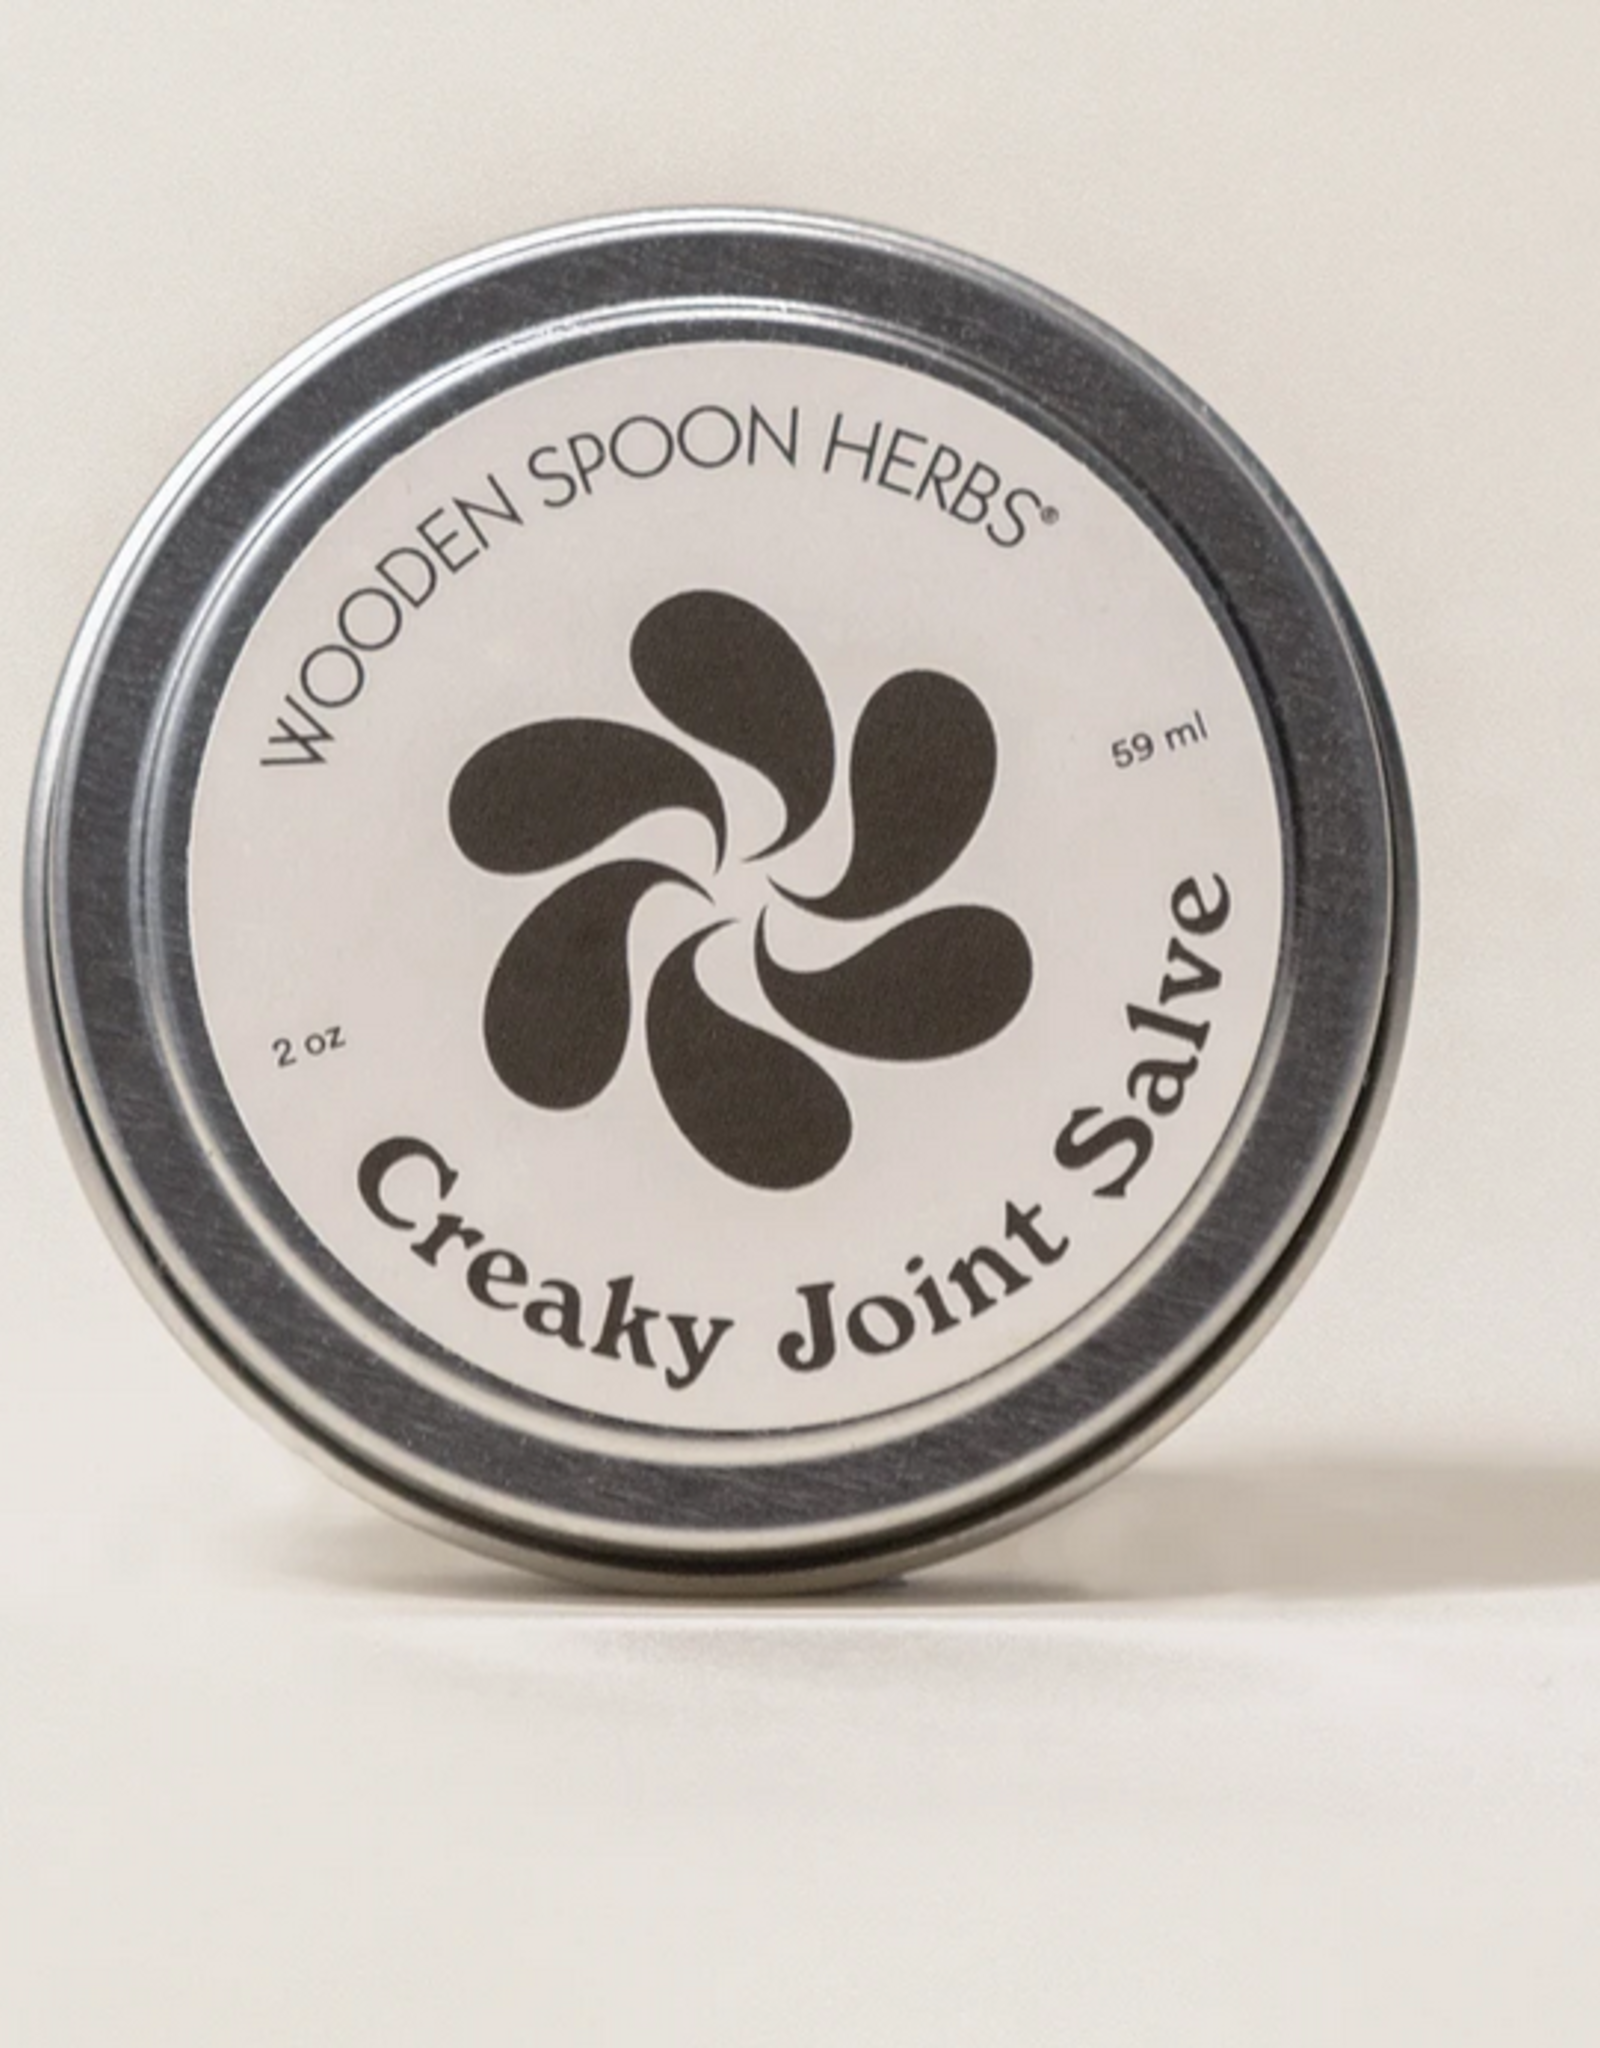 Wooden Spoon Herbs Creaky Joint Salve